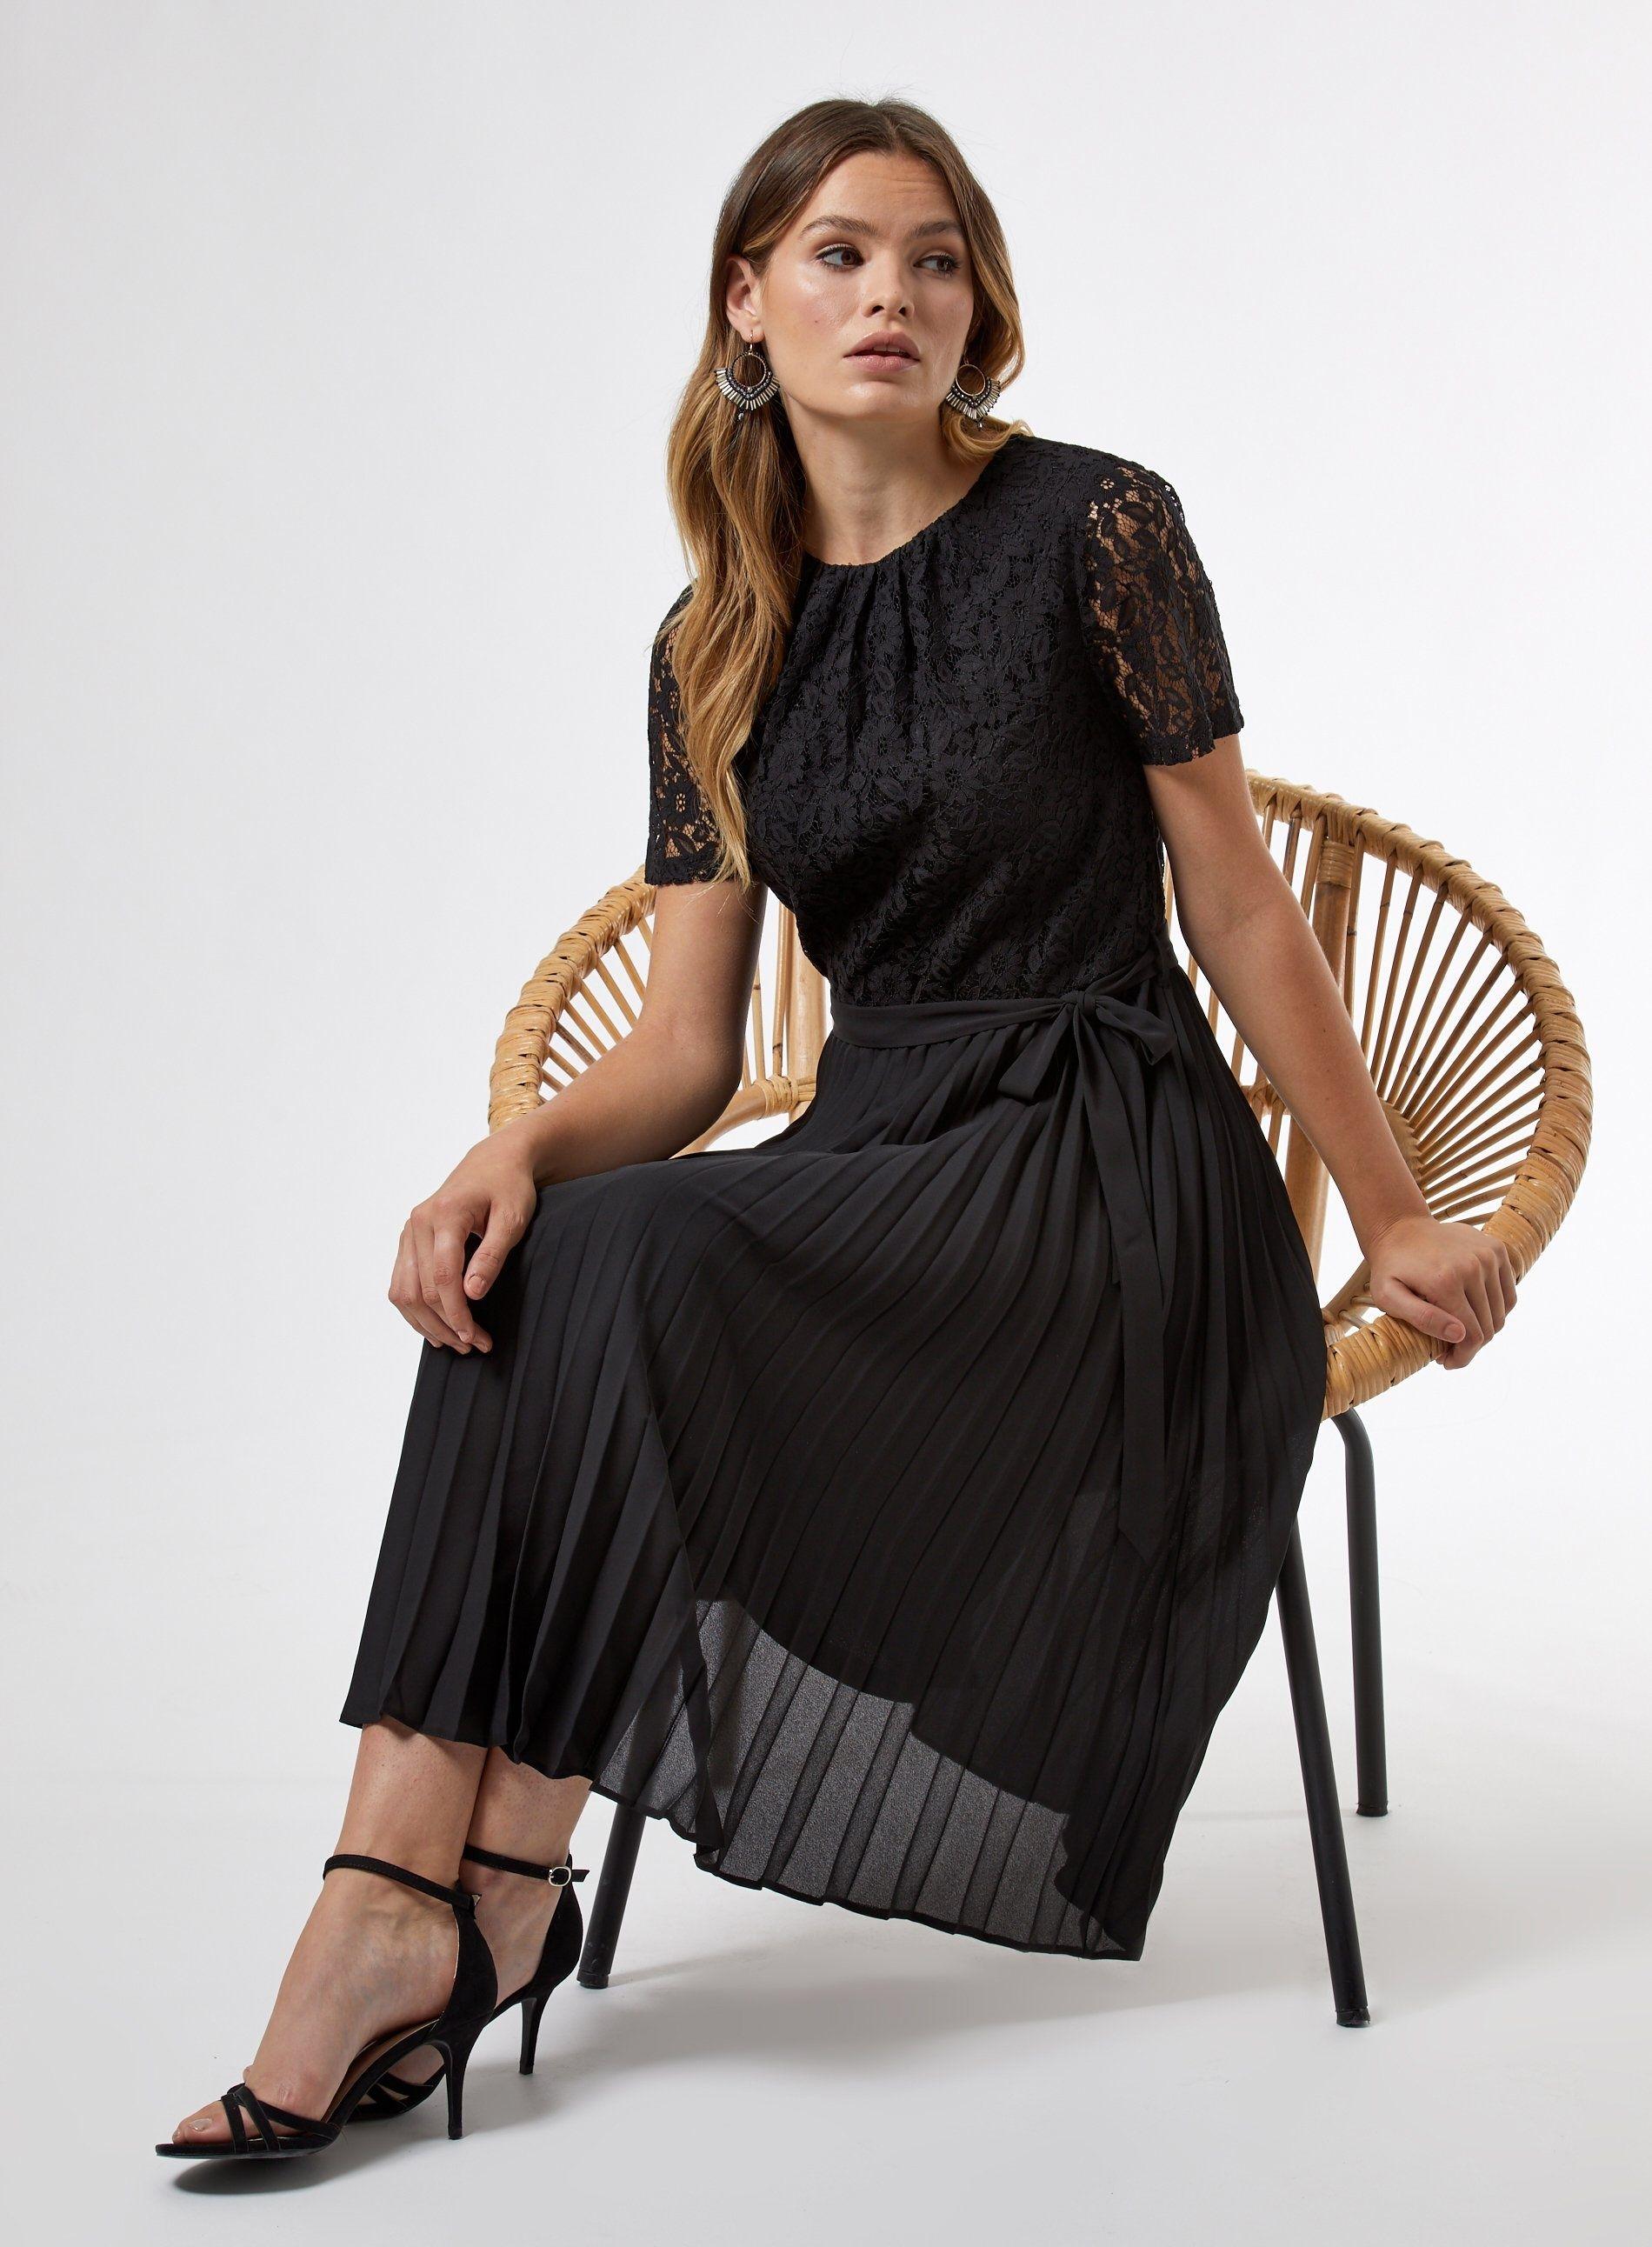 Dorothy Perkins Womens Black Lace Pleat Midi Dress Short Sleeve Round Neck